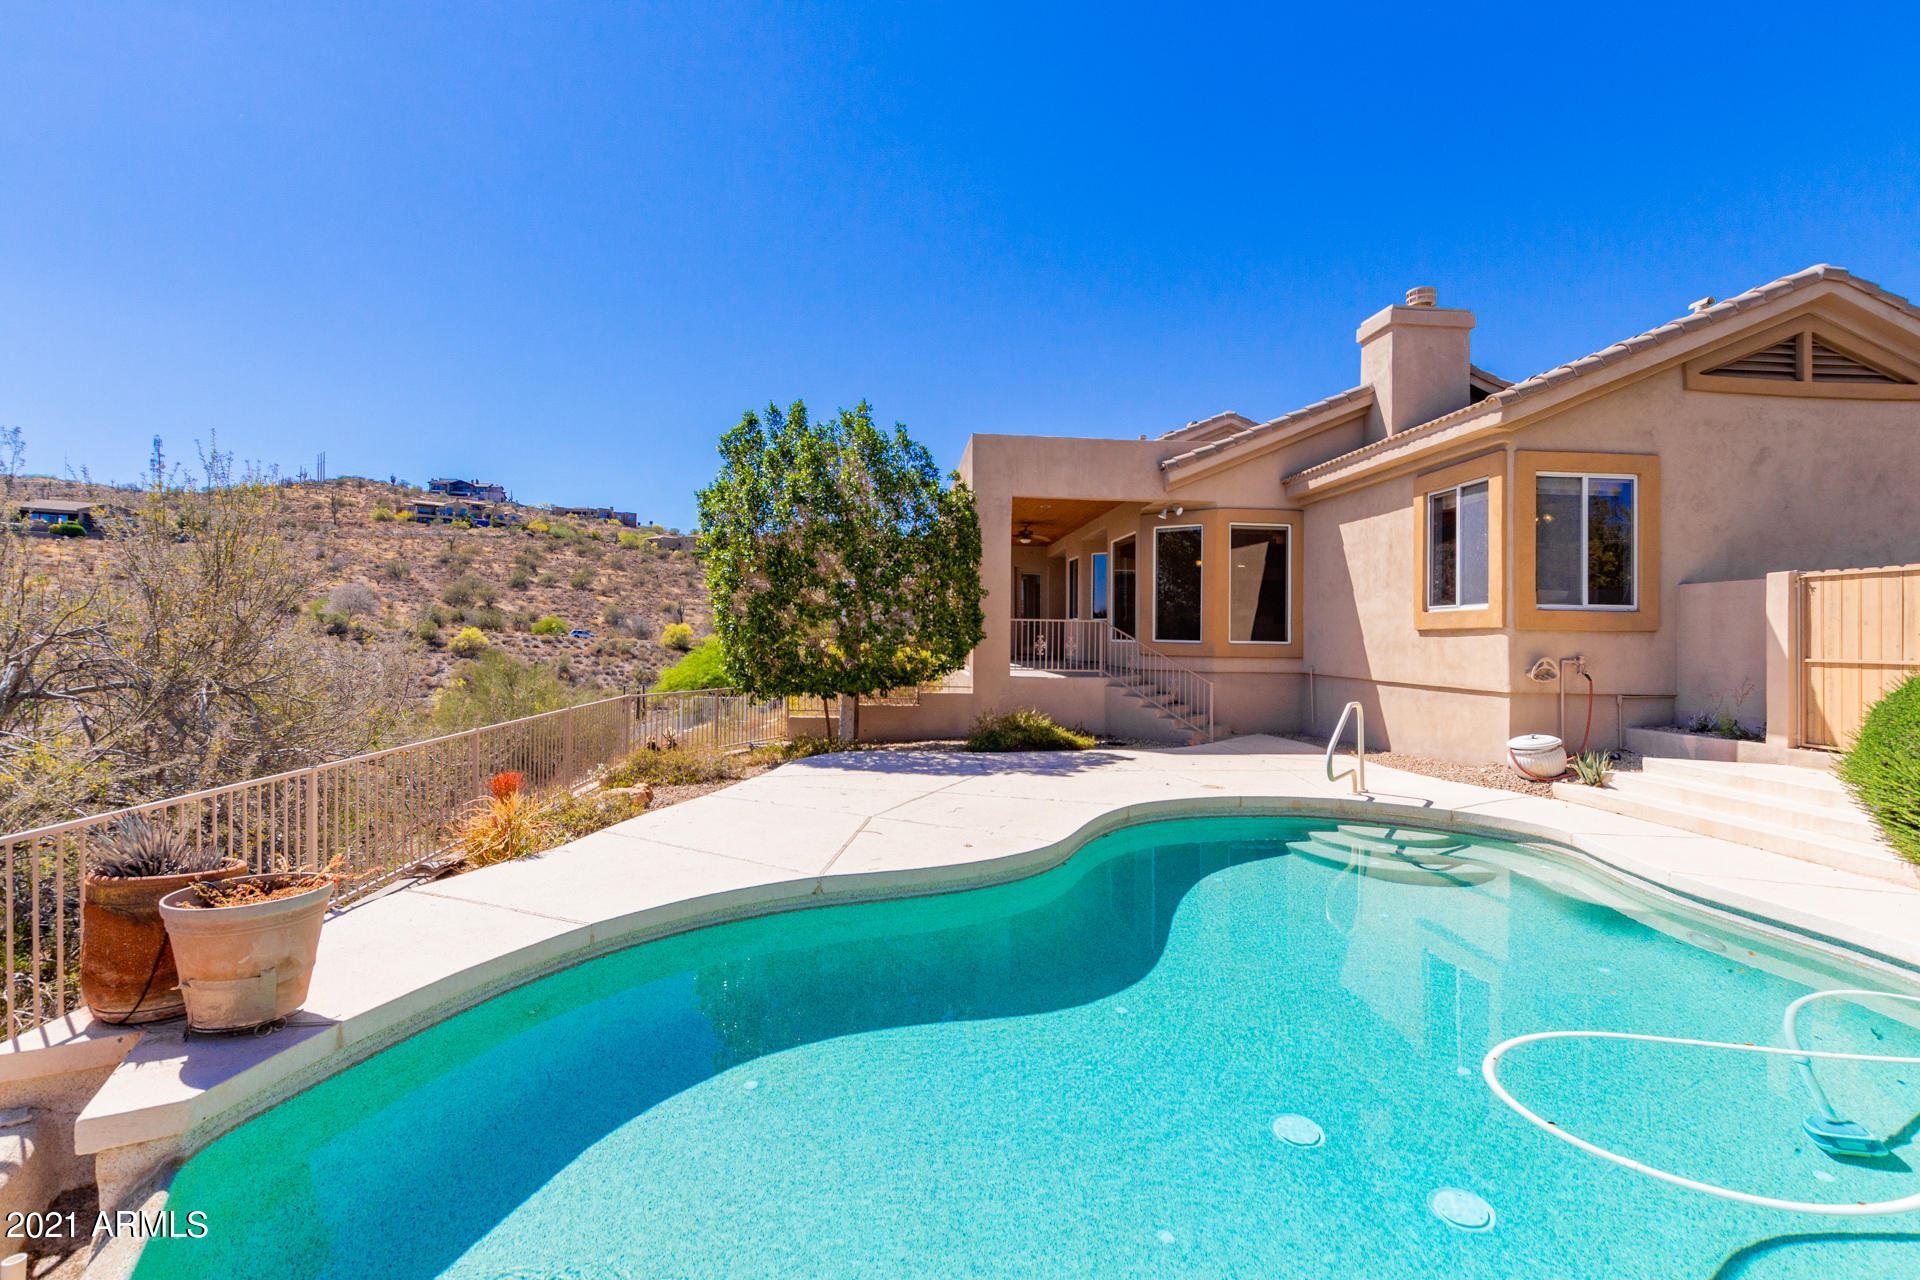 Photo of 15139 E WESTRIDGE Drive, Fountain Hills, AZ 85268 (MLS # 6230182)